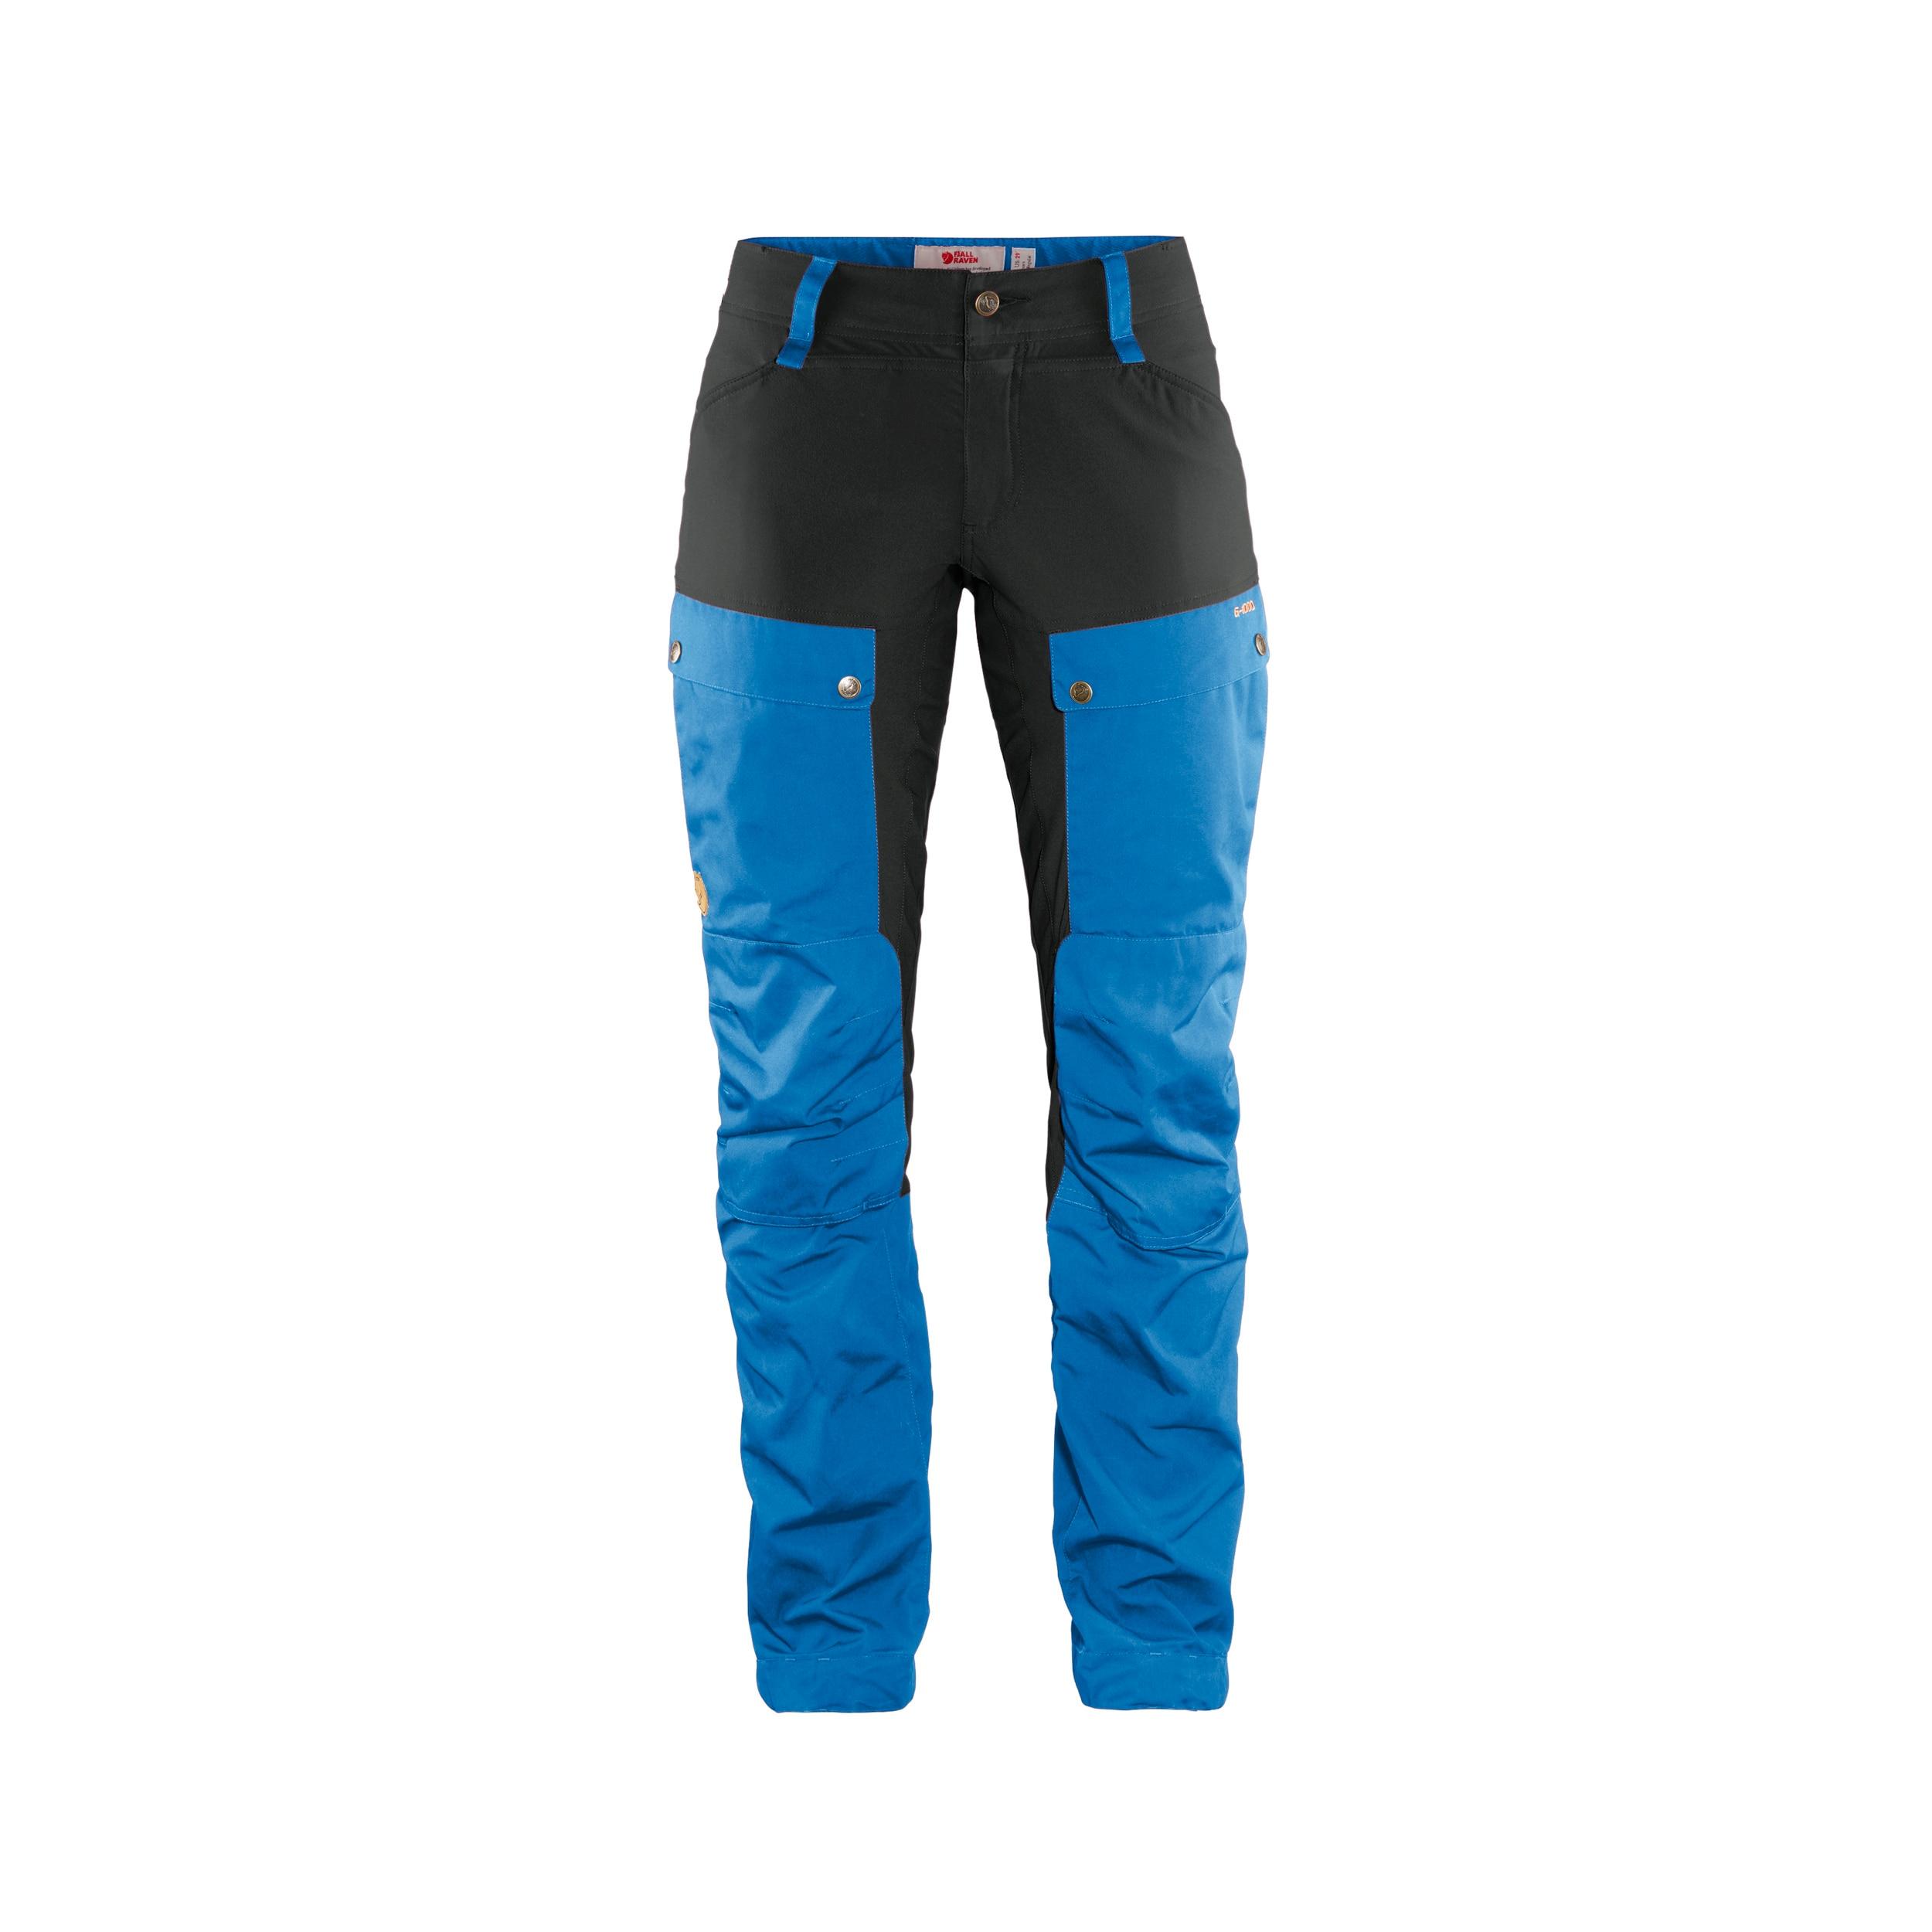 Fjällräven KEB Trousers Curved, W's